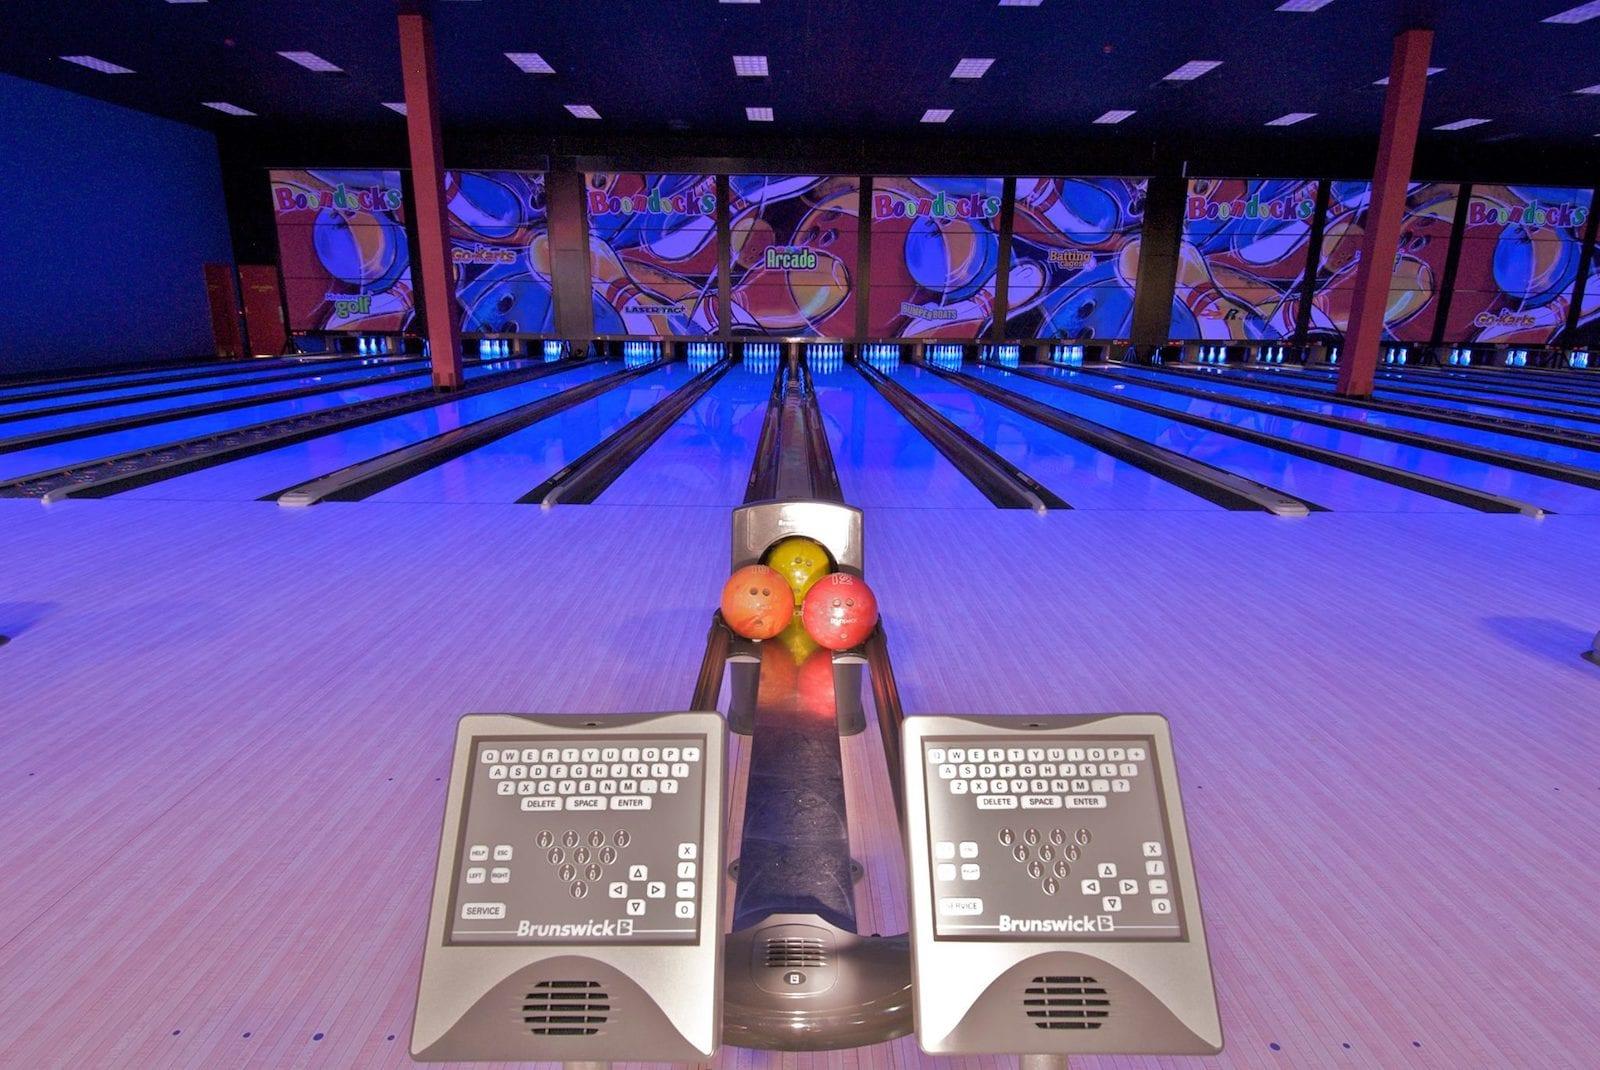 Bowling in Boondocks Fun Center, CO